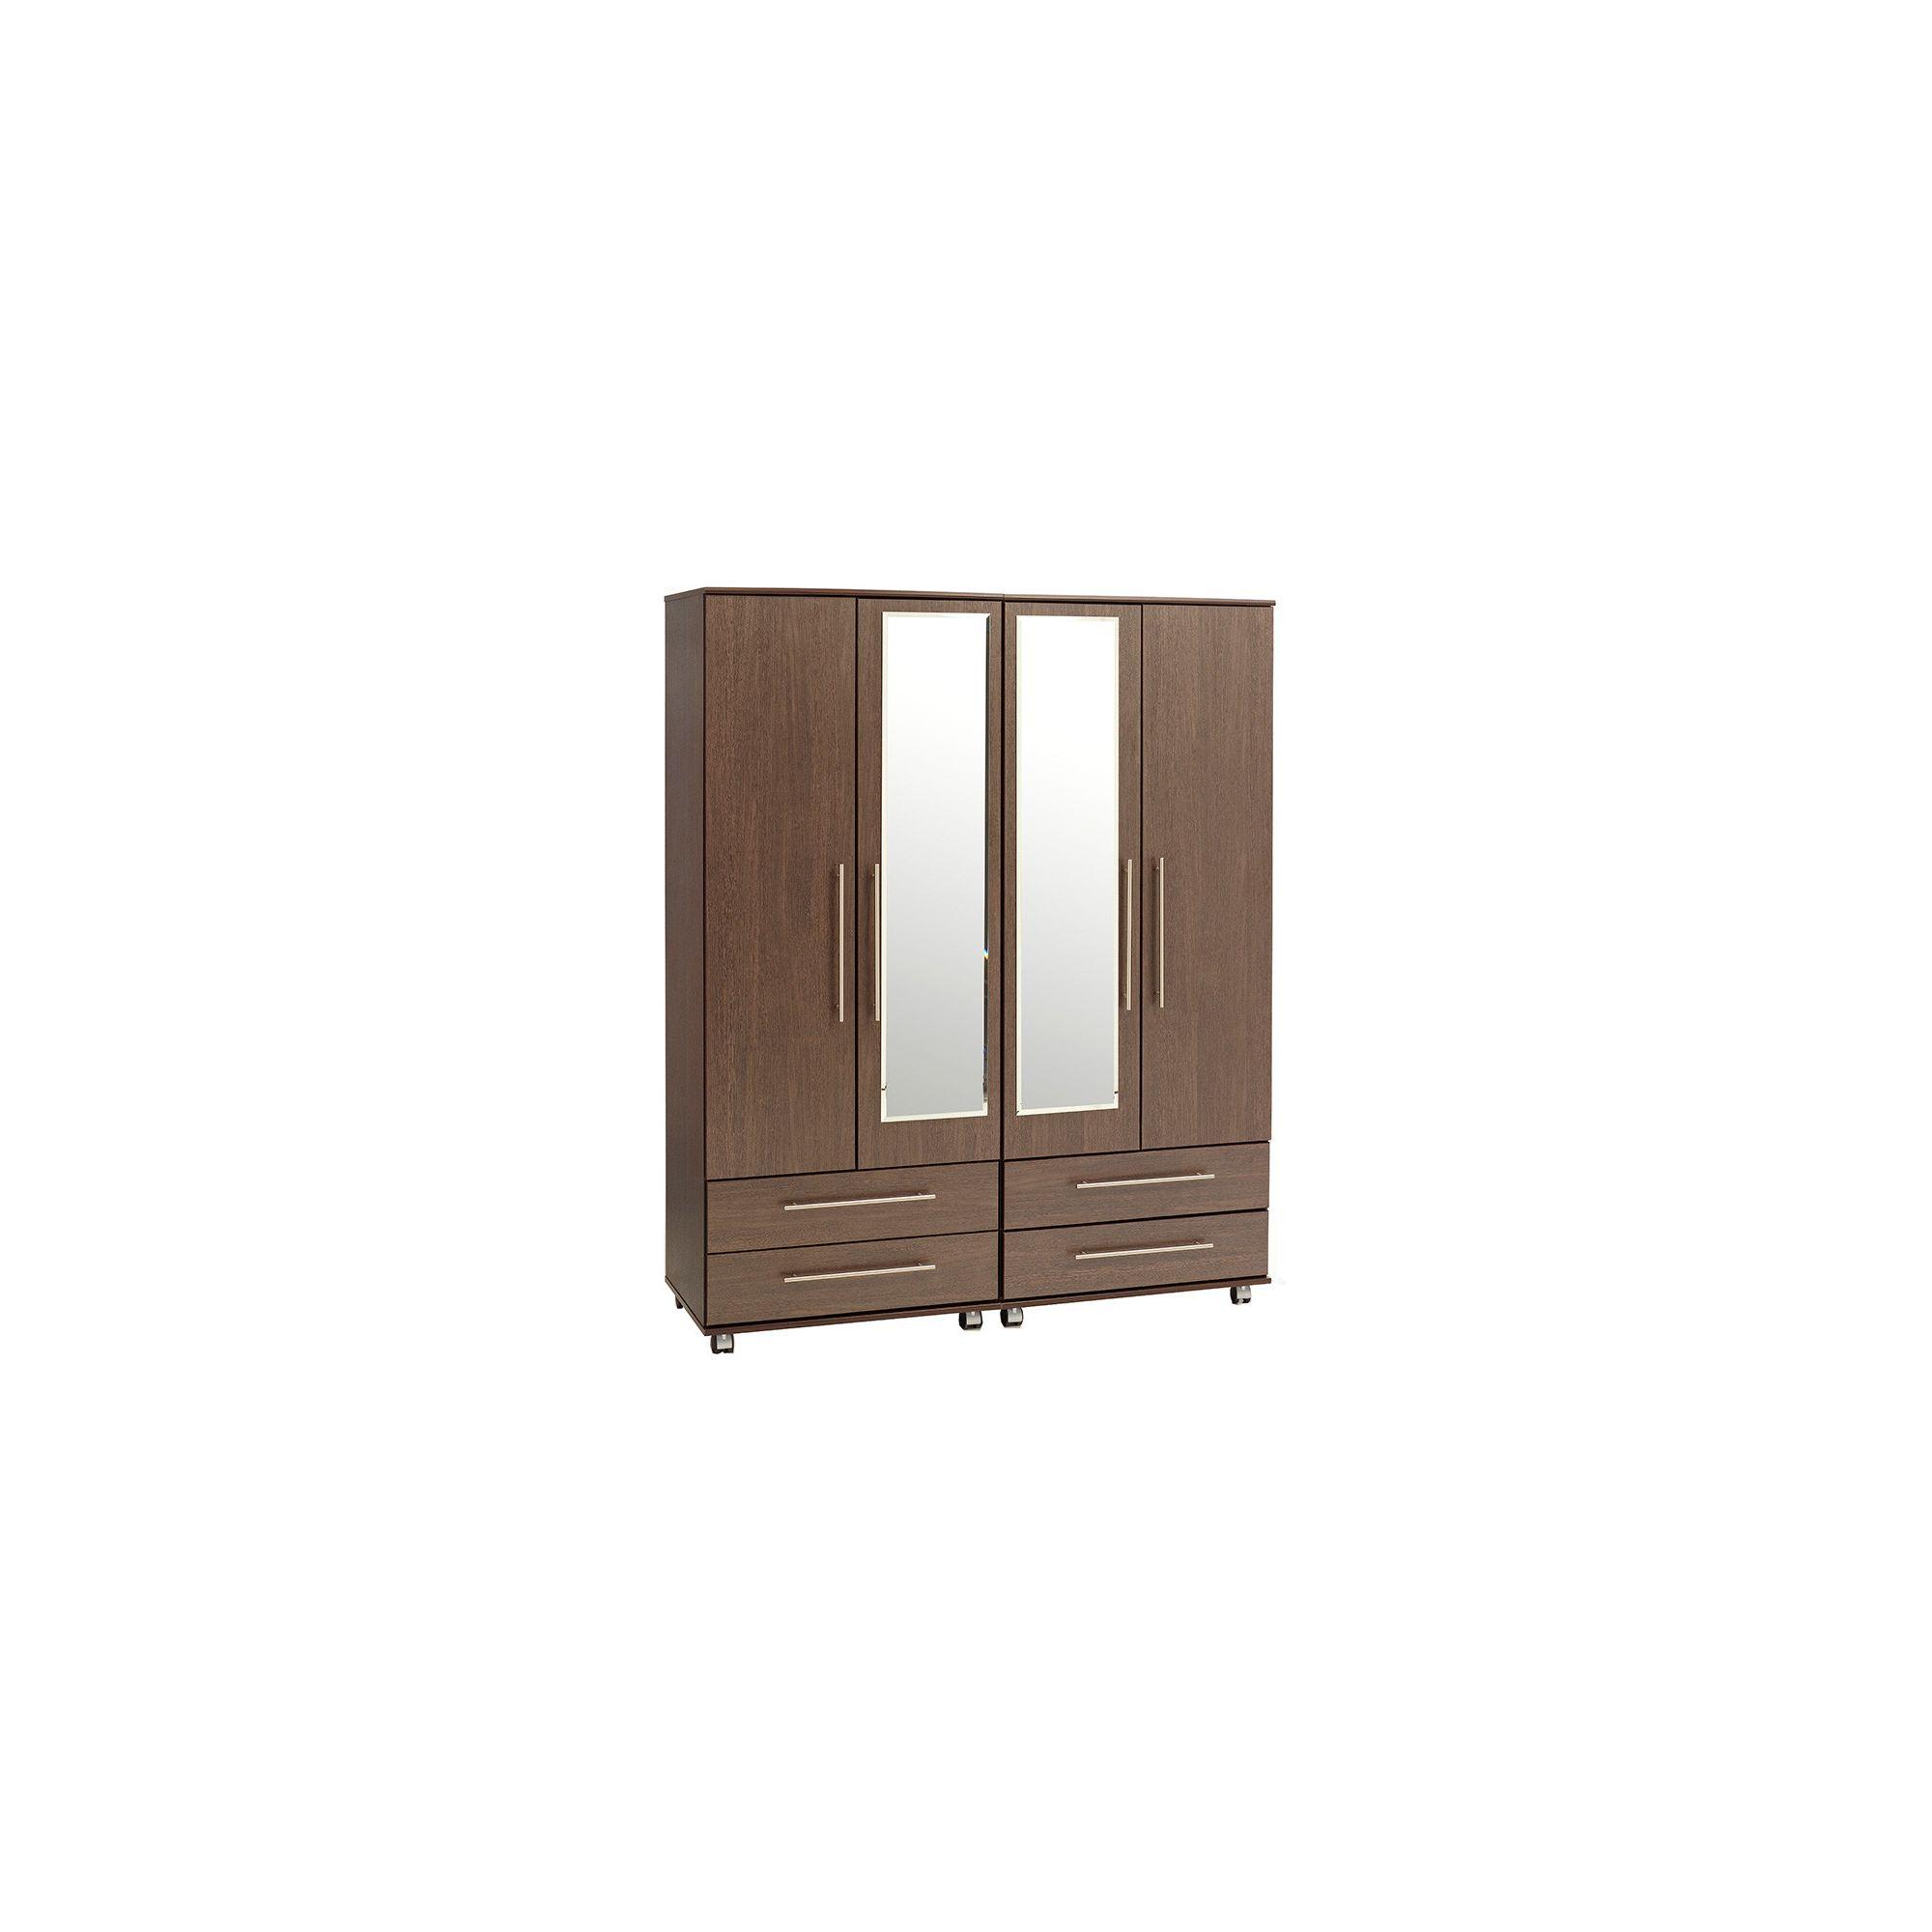 Ideal Furniture New York 4 Door Wardrobe - Oak at Tesco Direct